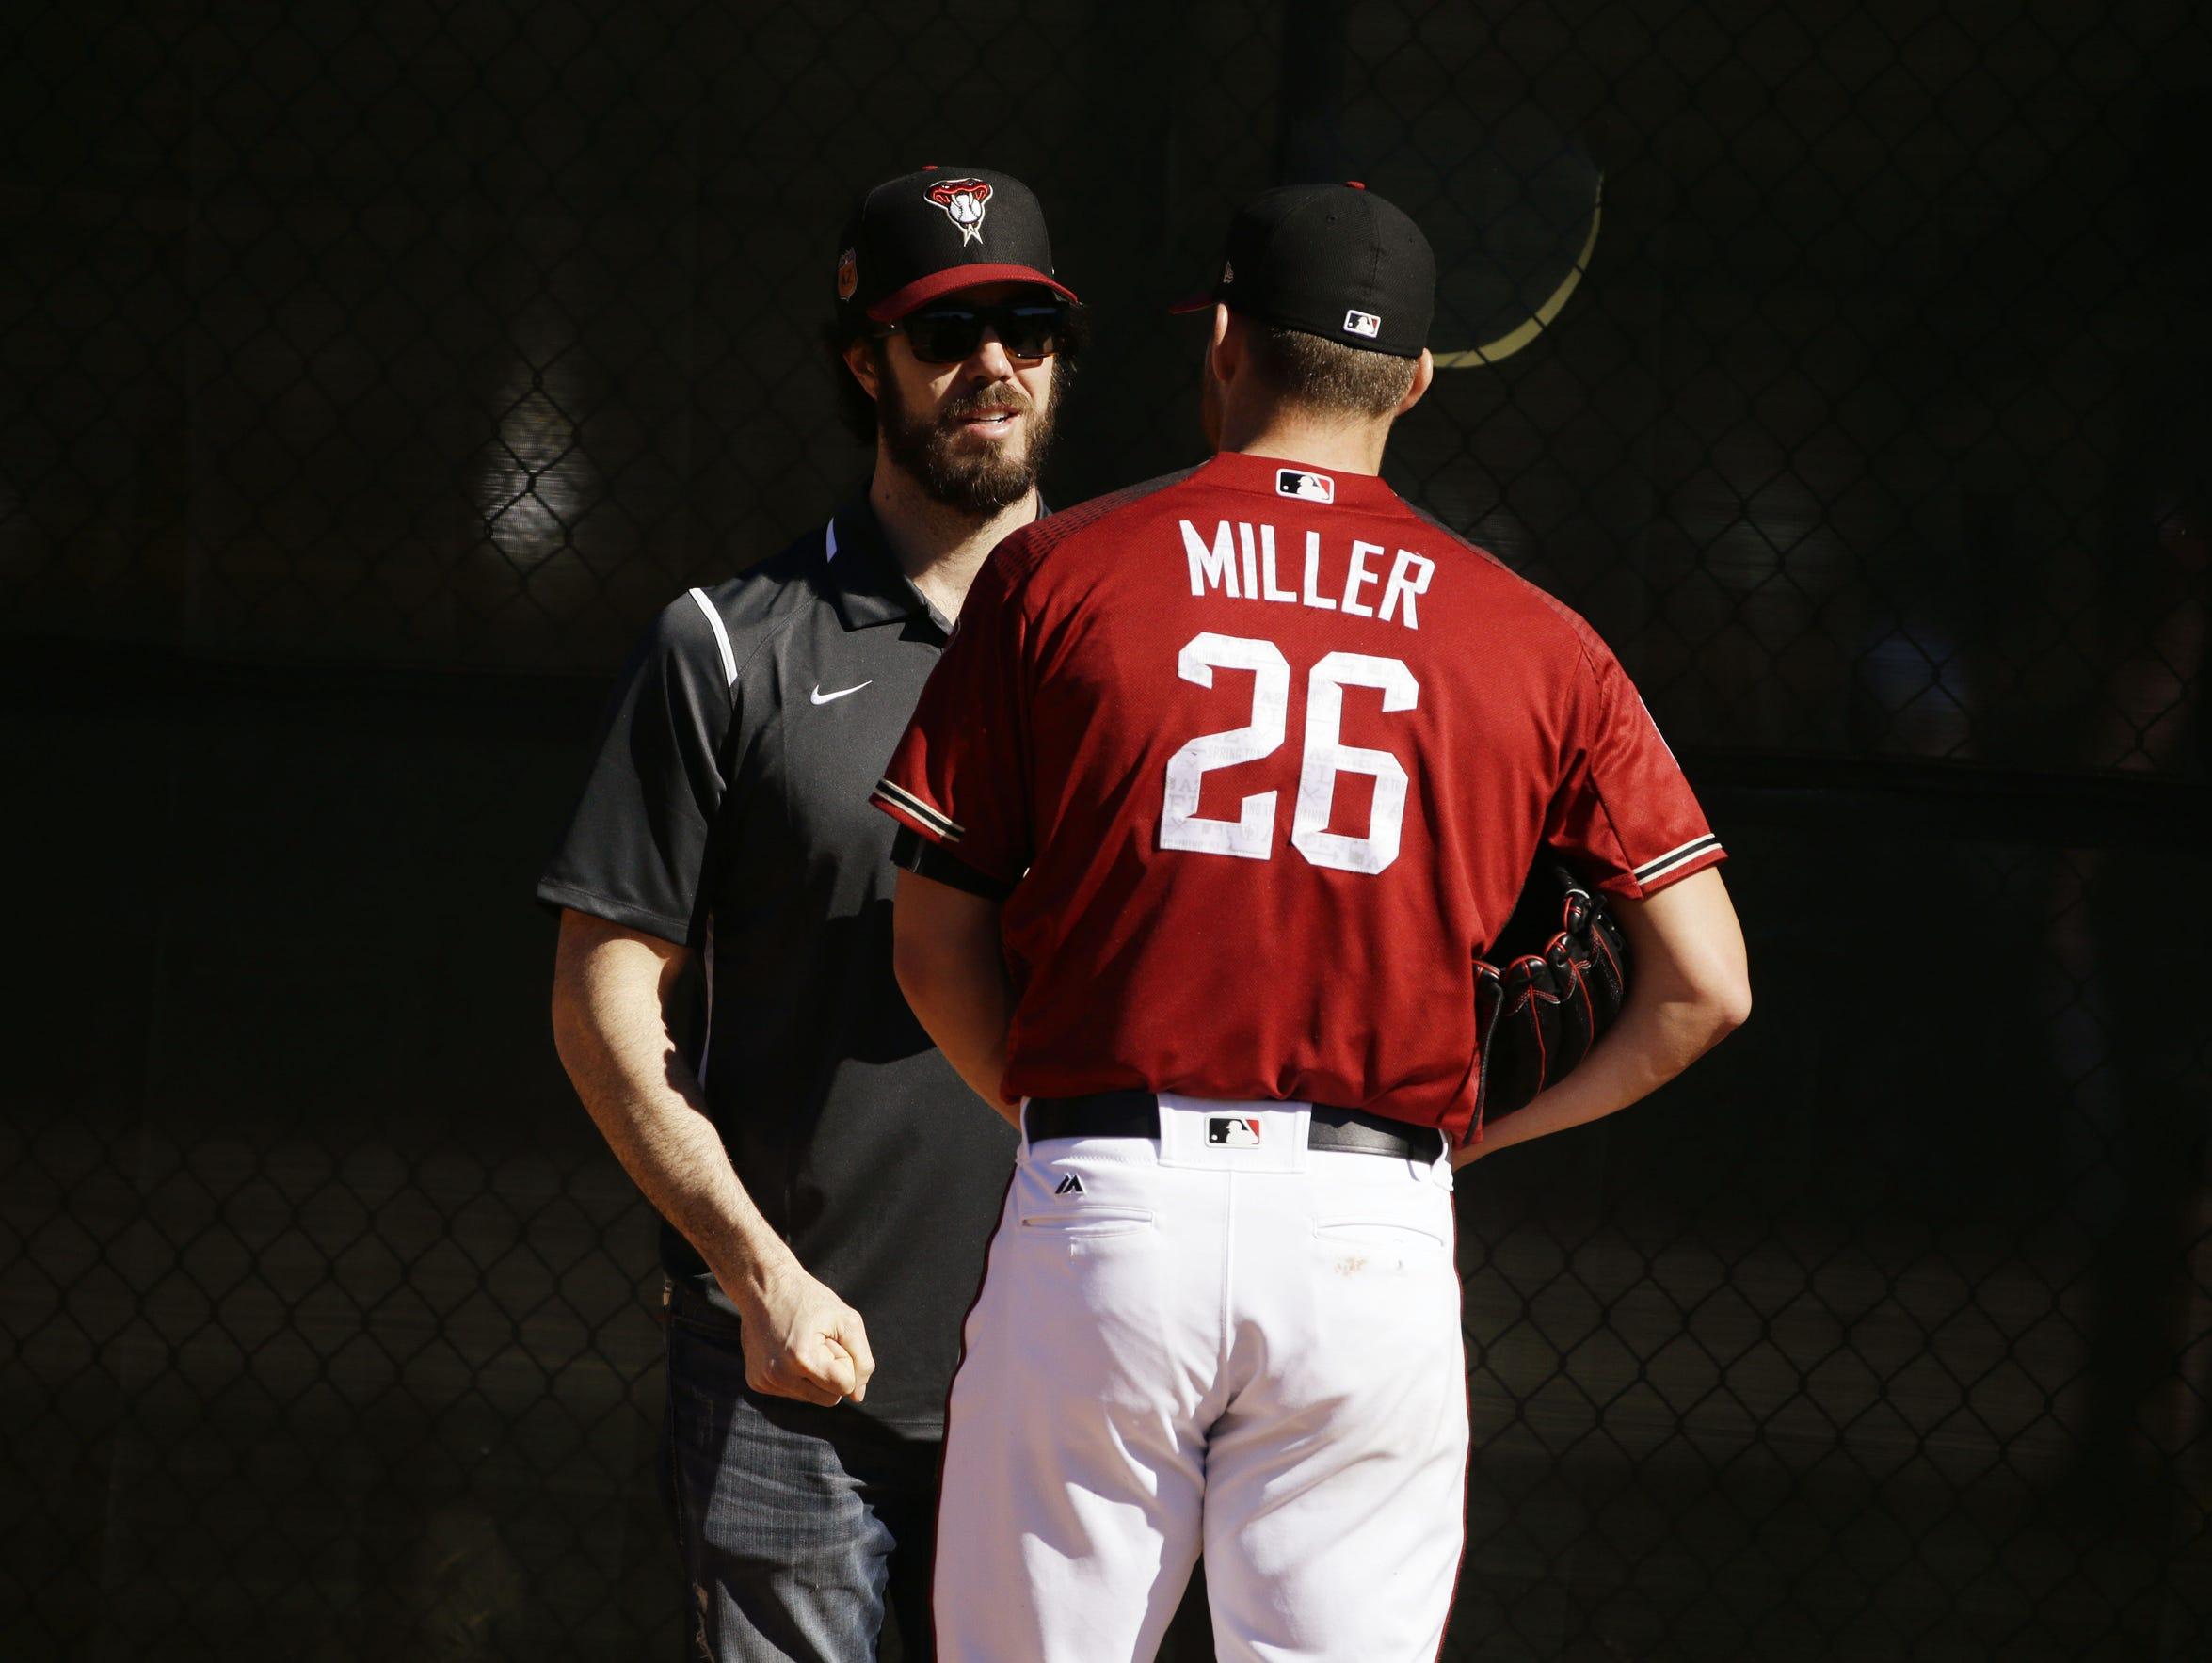 Diamondbacks starting pitcher Shelby Miller talks to